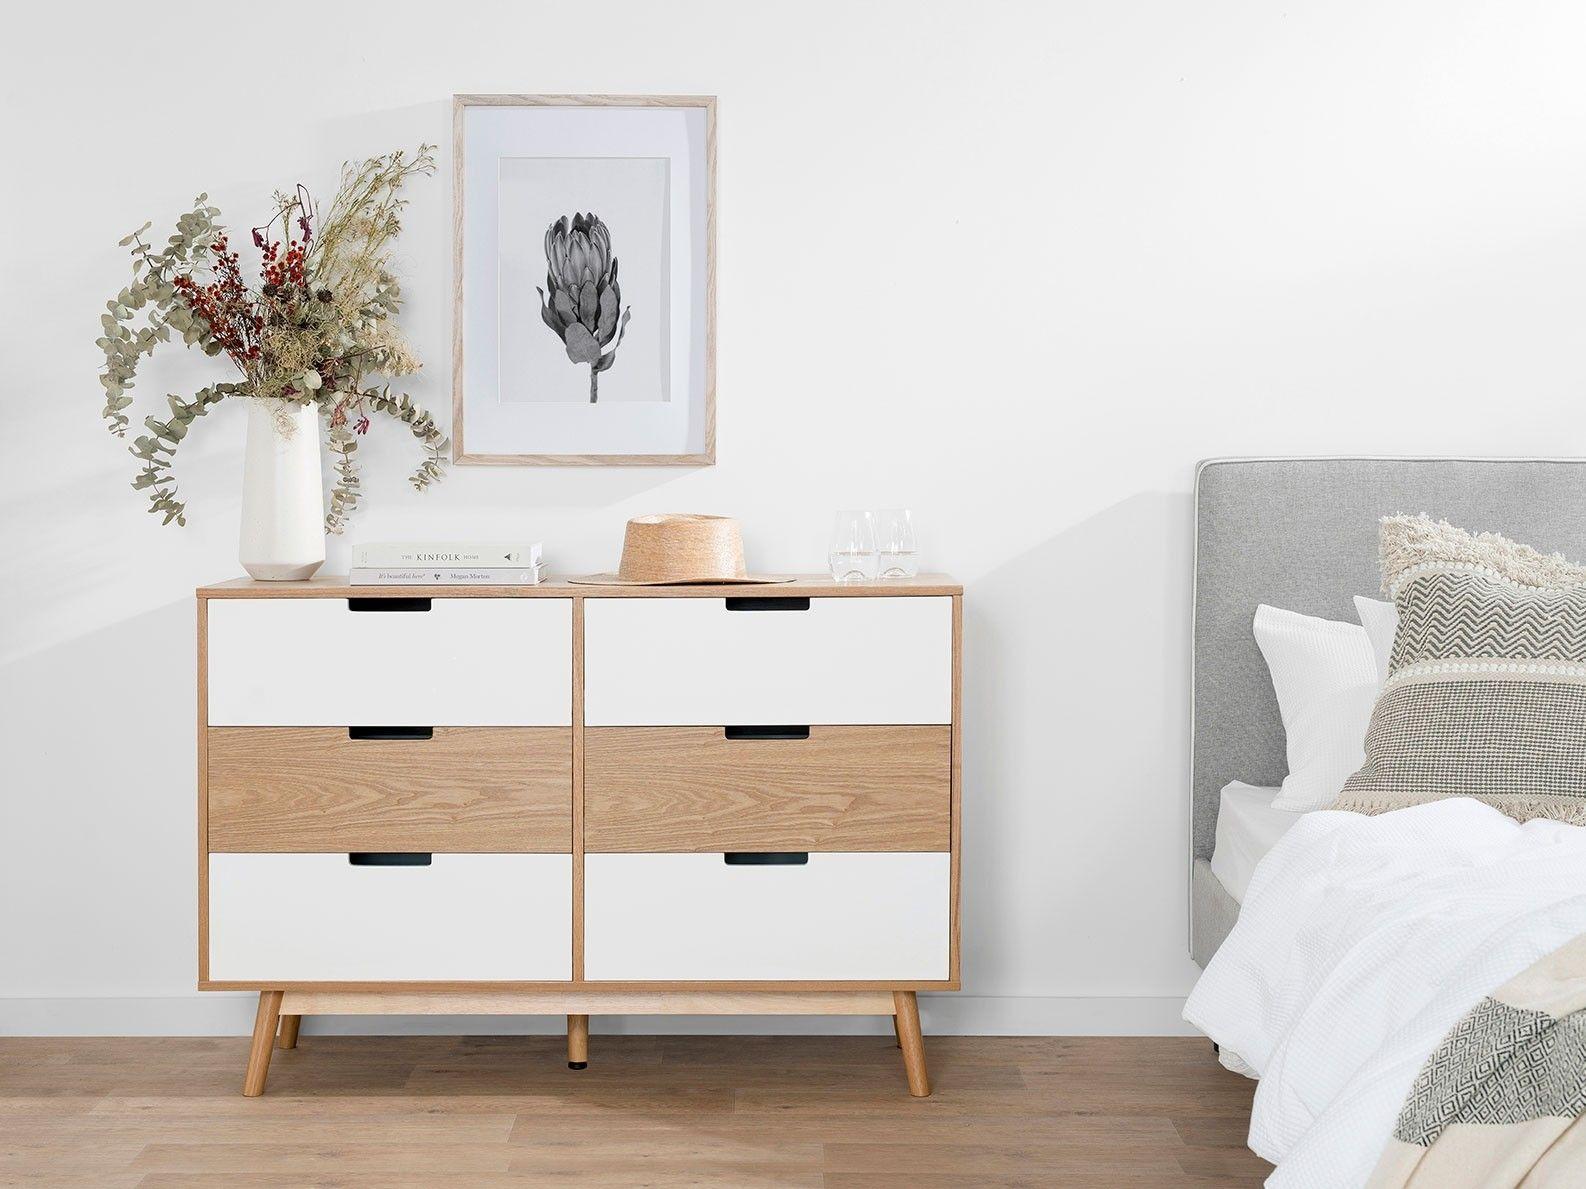 Marlow Six Drawer Wide Bedroom Furniture Mocka Au In 2020 Furniture Selling Furniture Furniture Packages